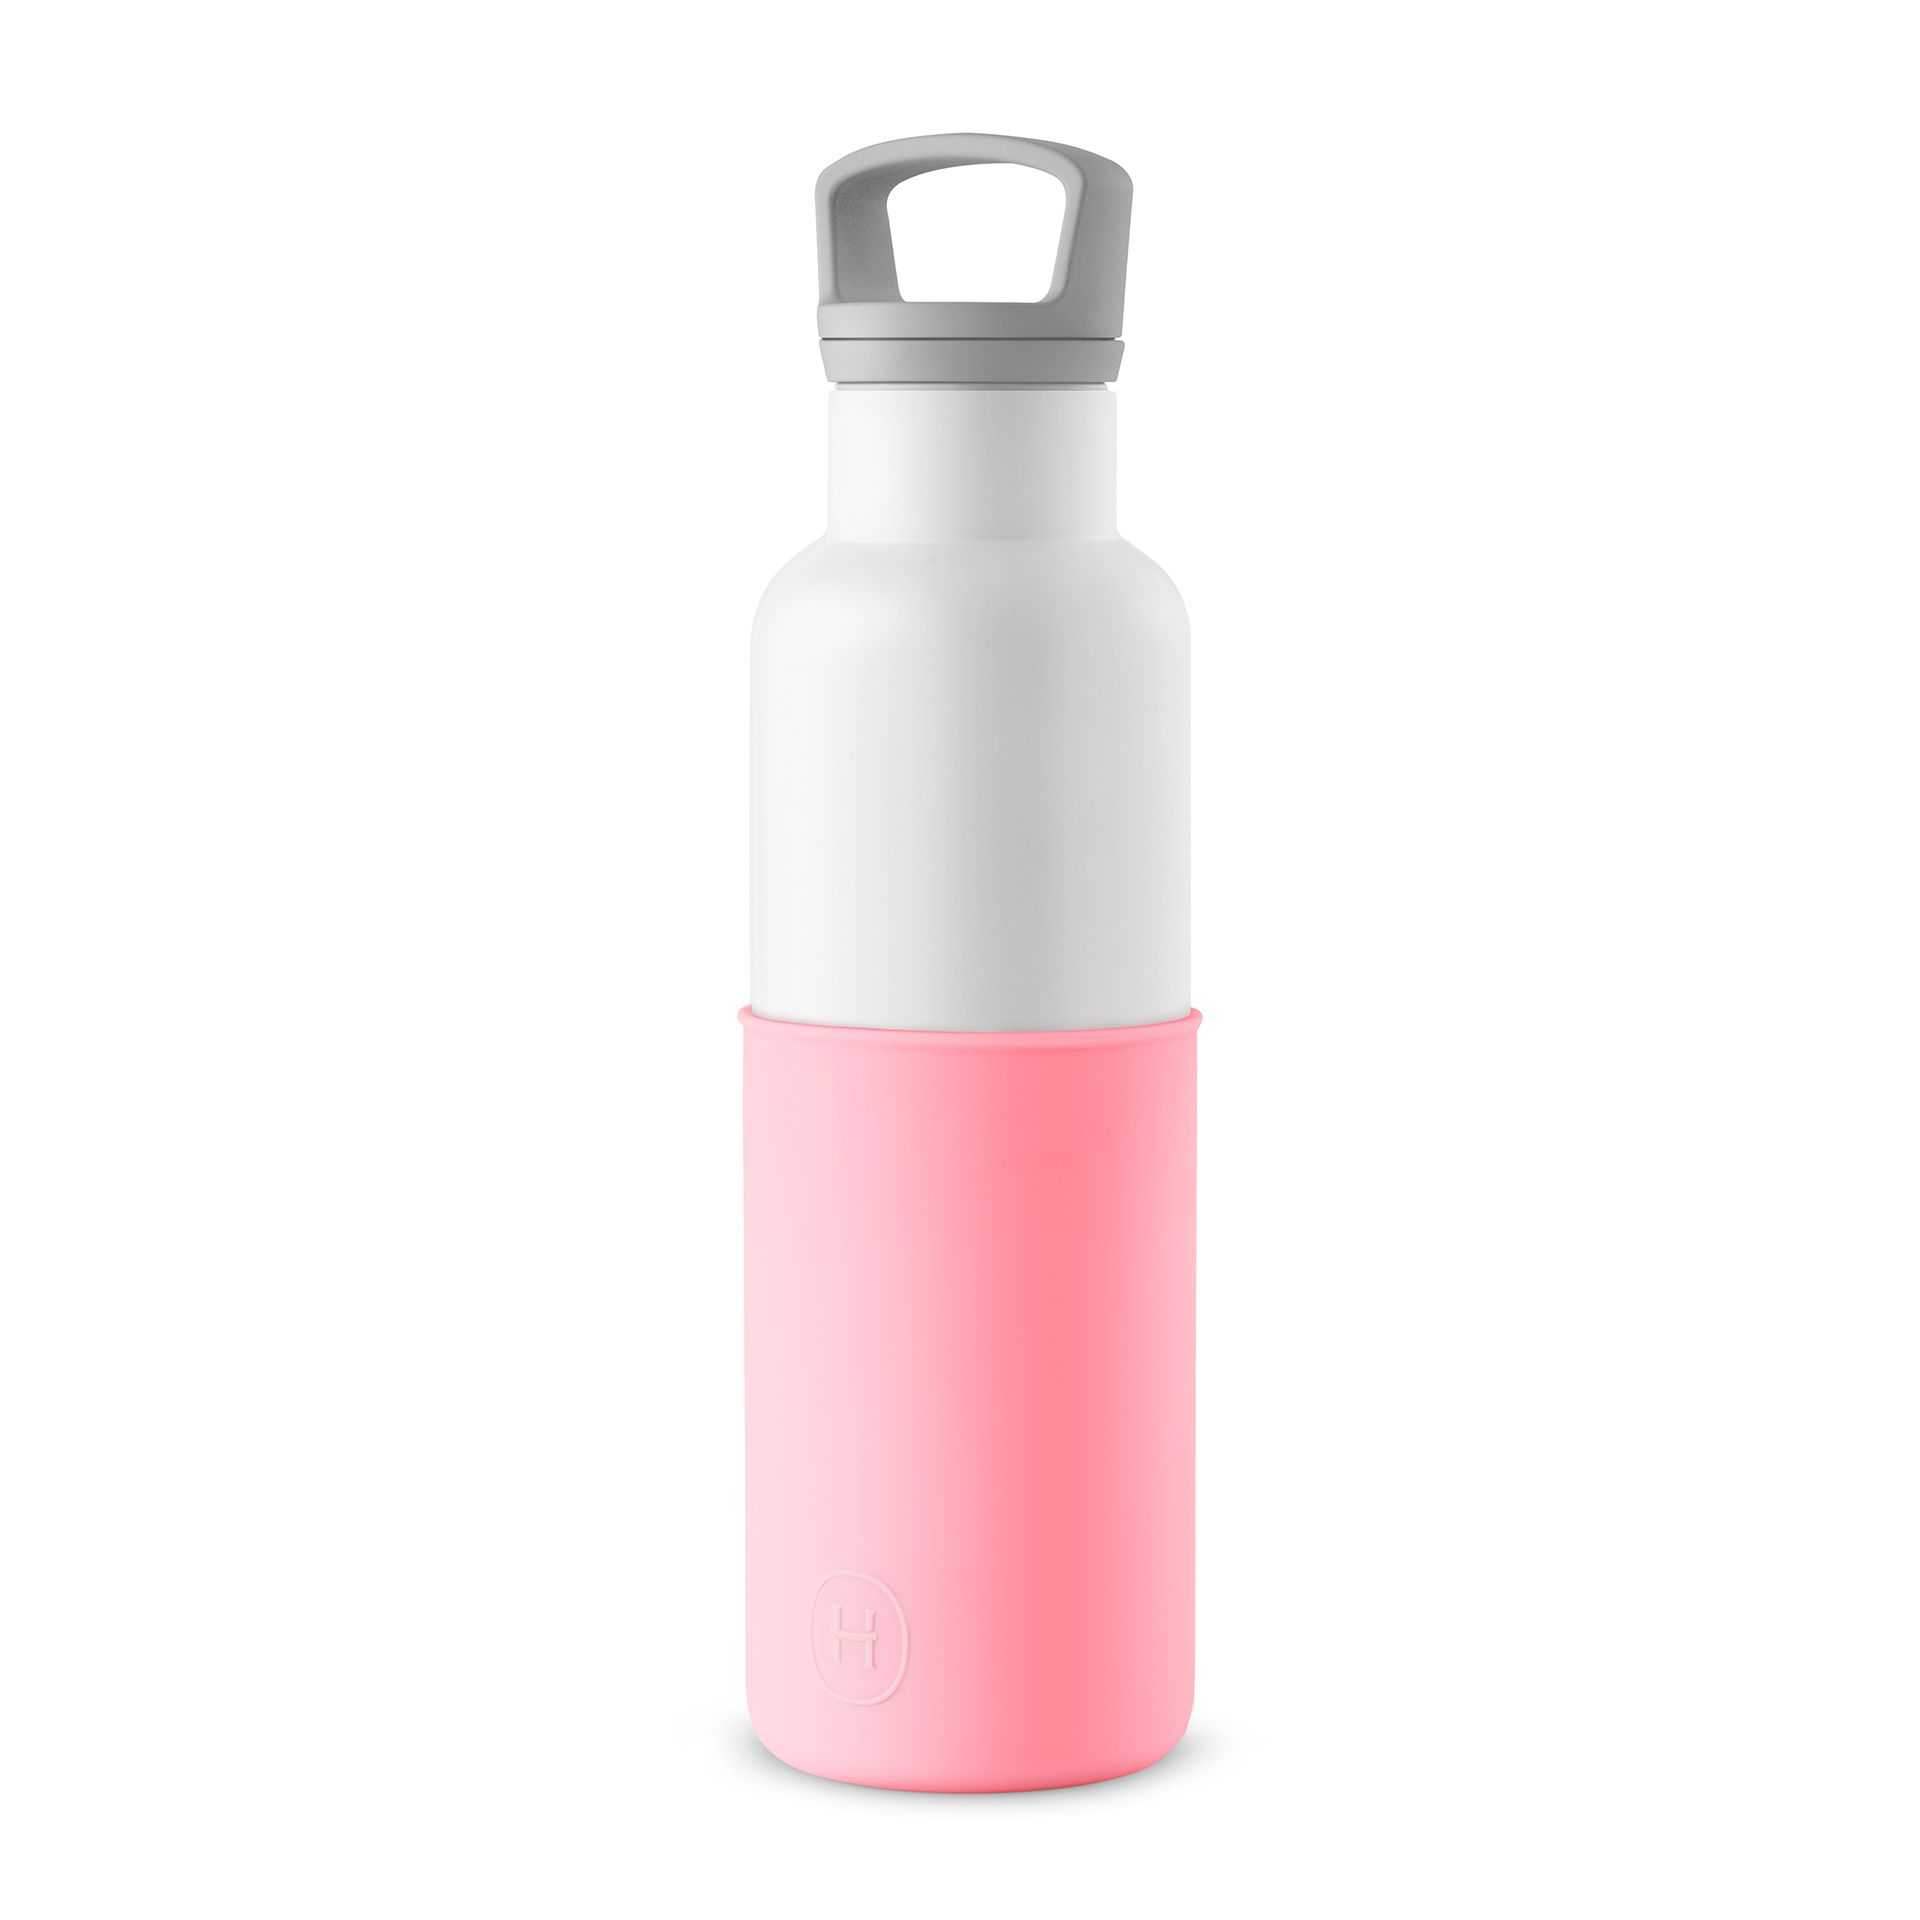 【HYDY】玫瑰粉-白瓶 590ml